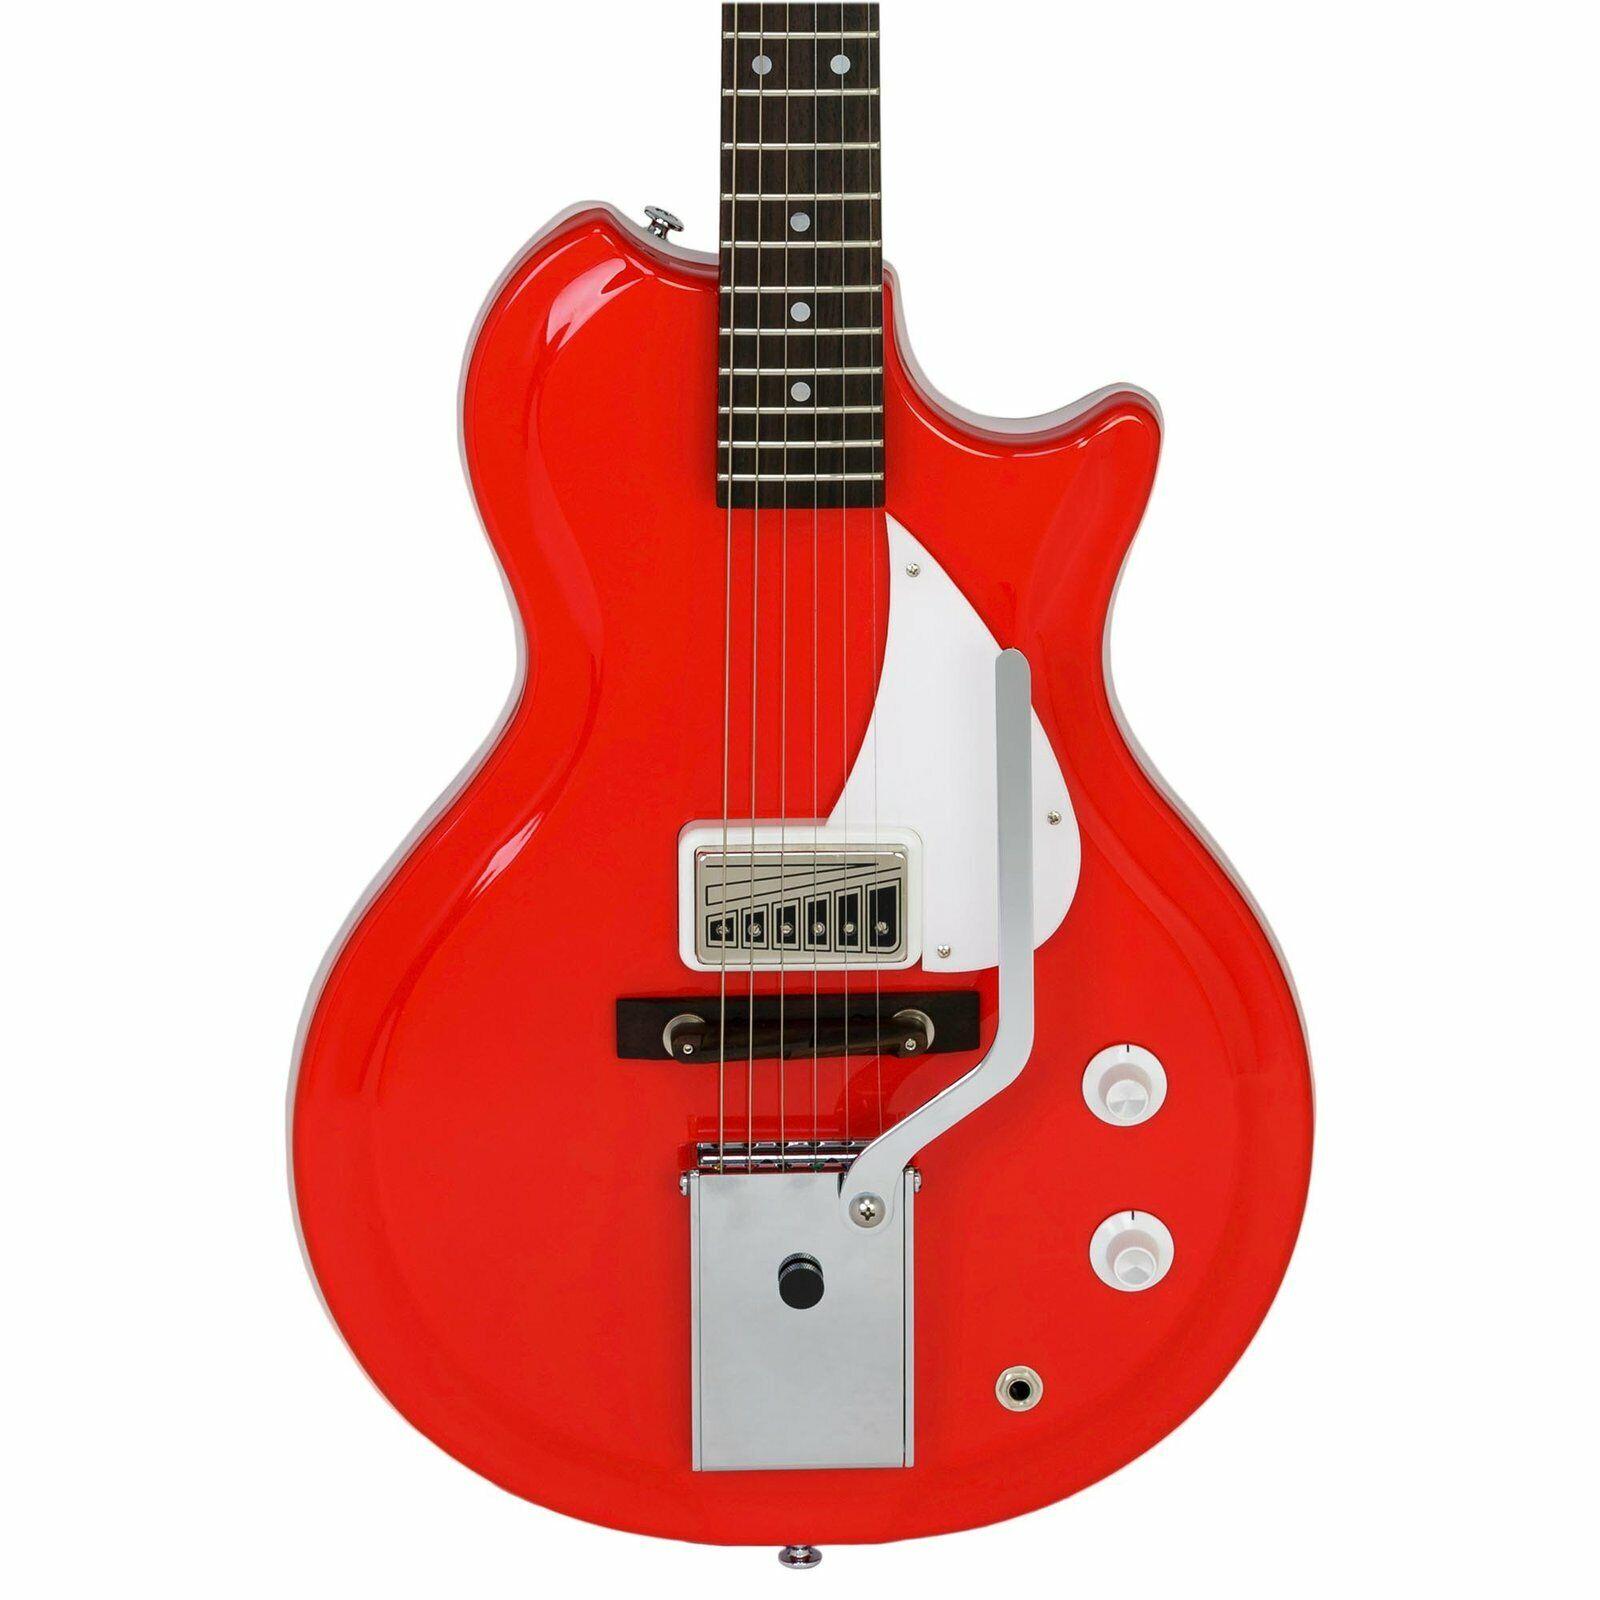 Supro 1572VPR Belmont Vibrato Americana Series Electric Guitar - Poppy rot